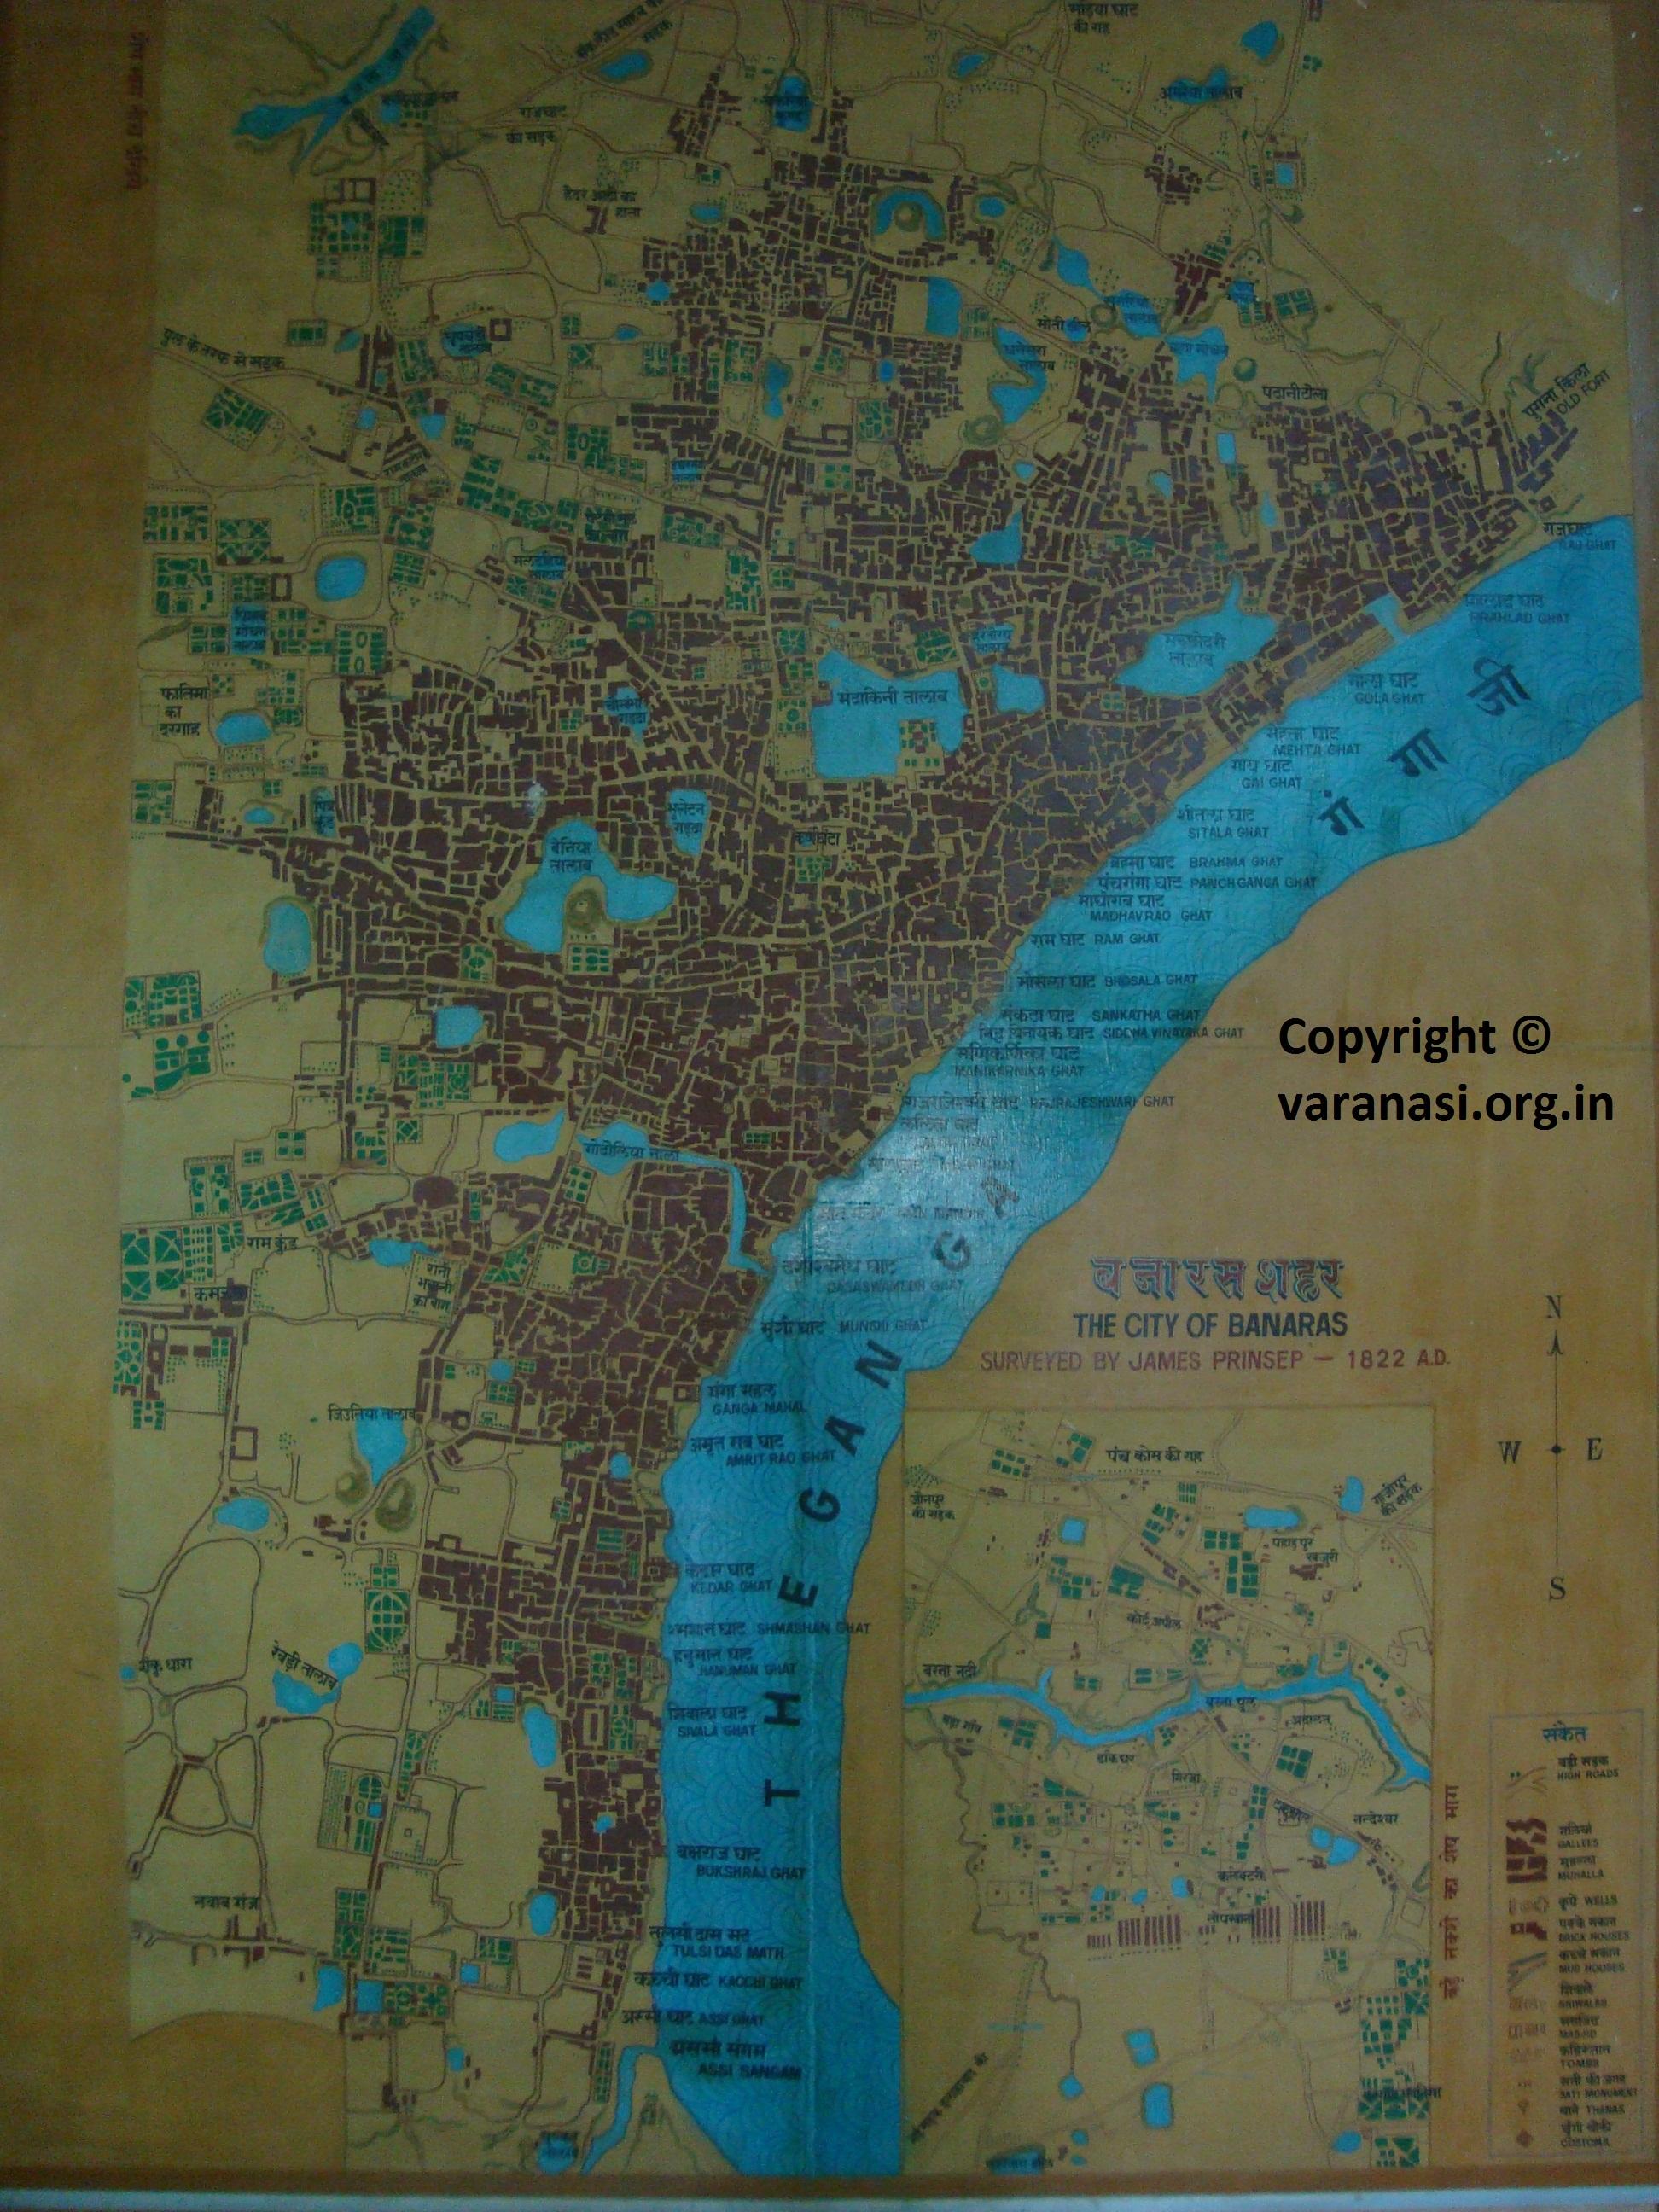 Varanasi Map Map of Varanasi Varanasi City Satellite map